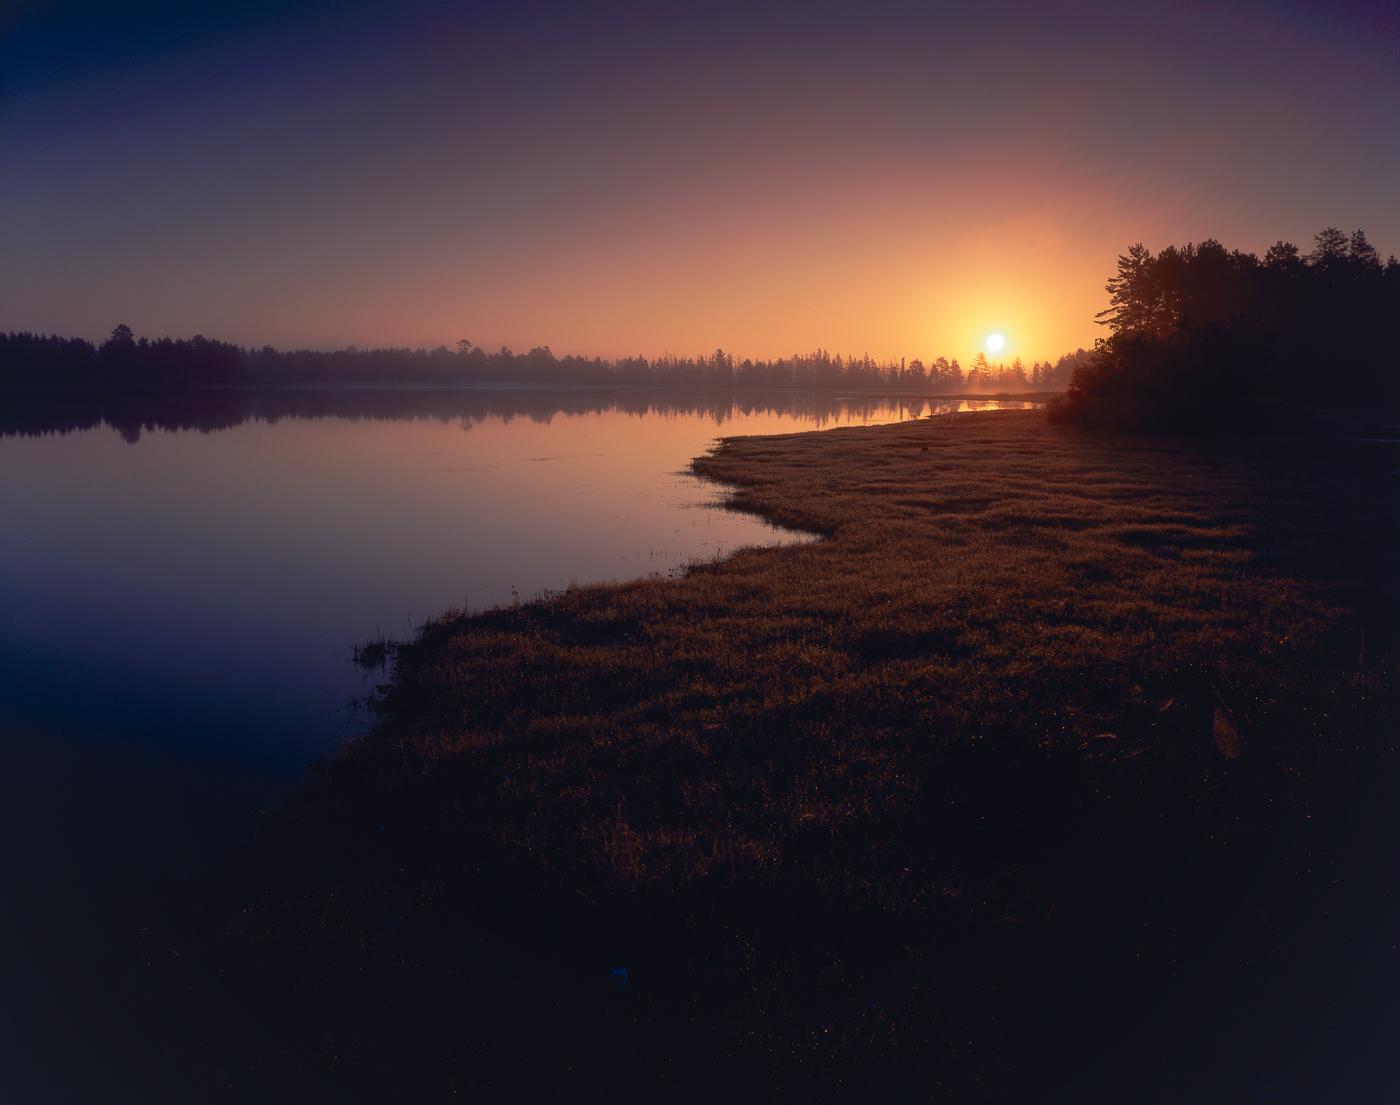 MORNING LIGHT AT SENEY NATIONAL WILDLIFE REFUGE, UPPER PENINSULA, MICHIGAN